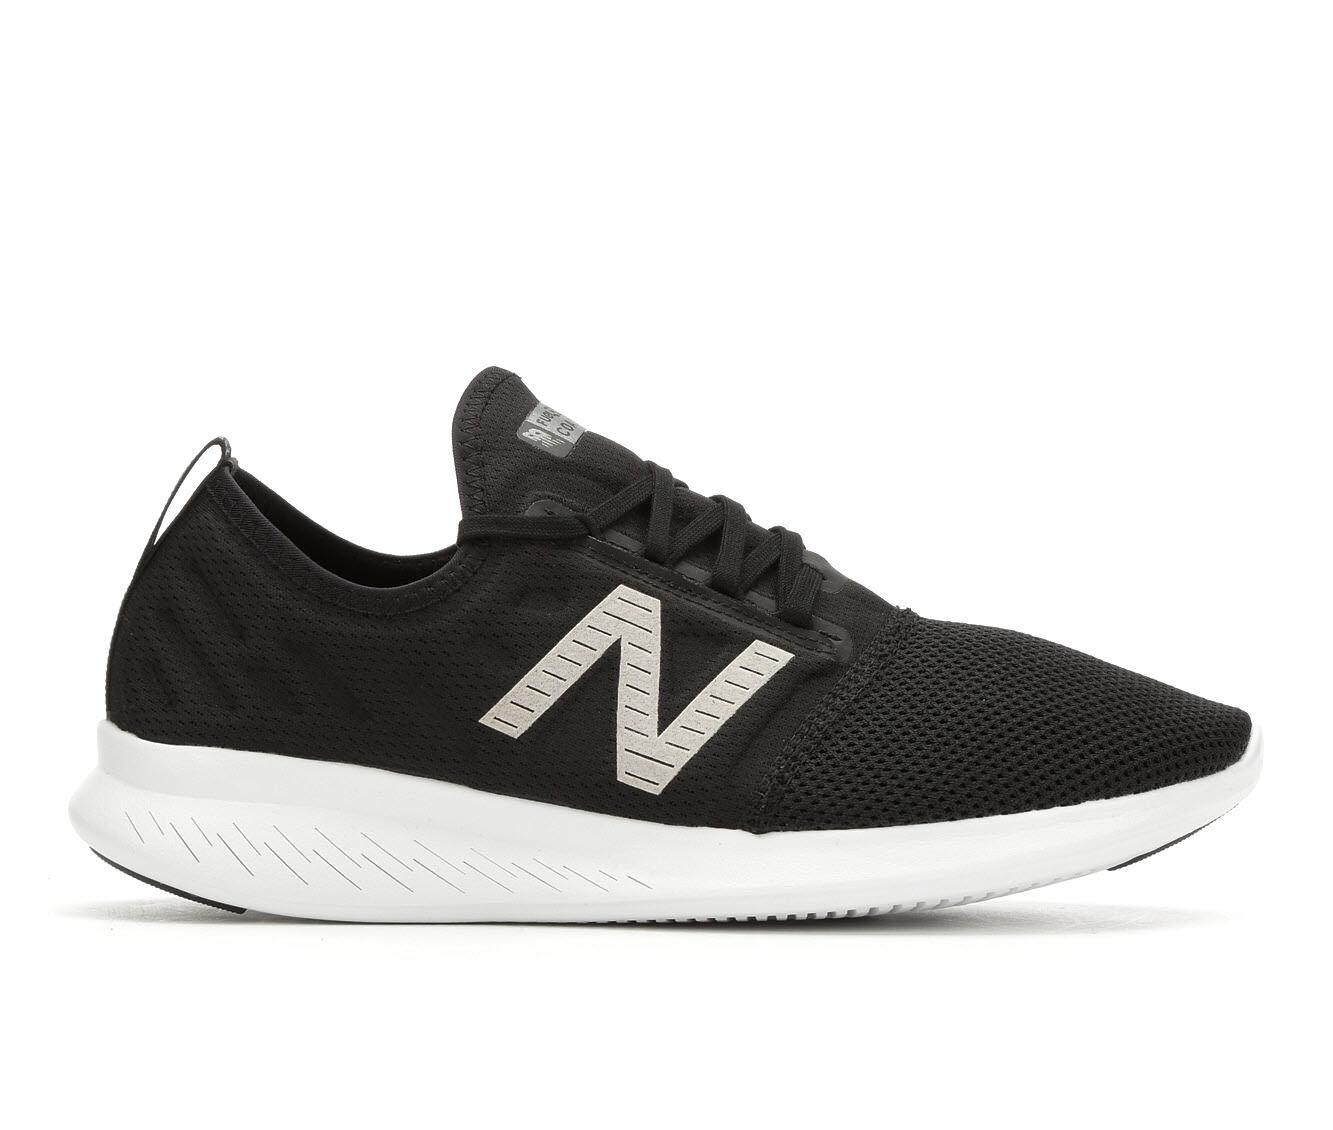 Men's New Balance Coast 4 Running Shoes Blk/Wht